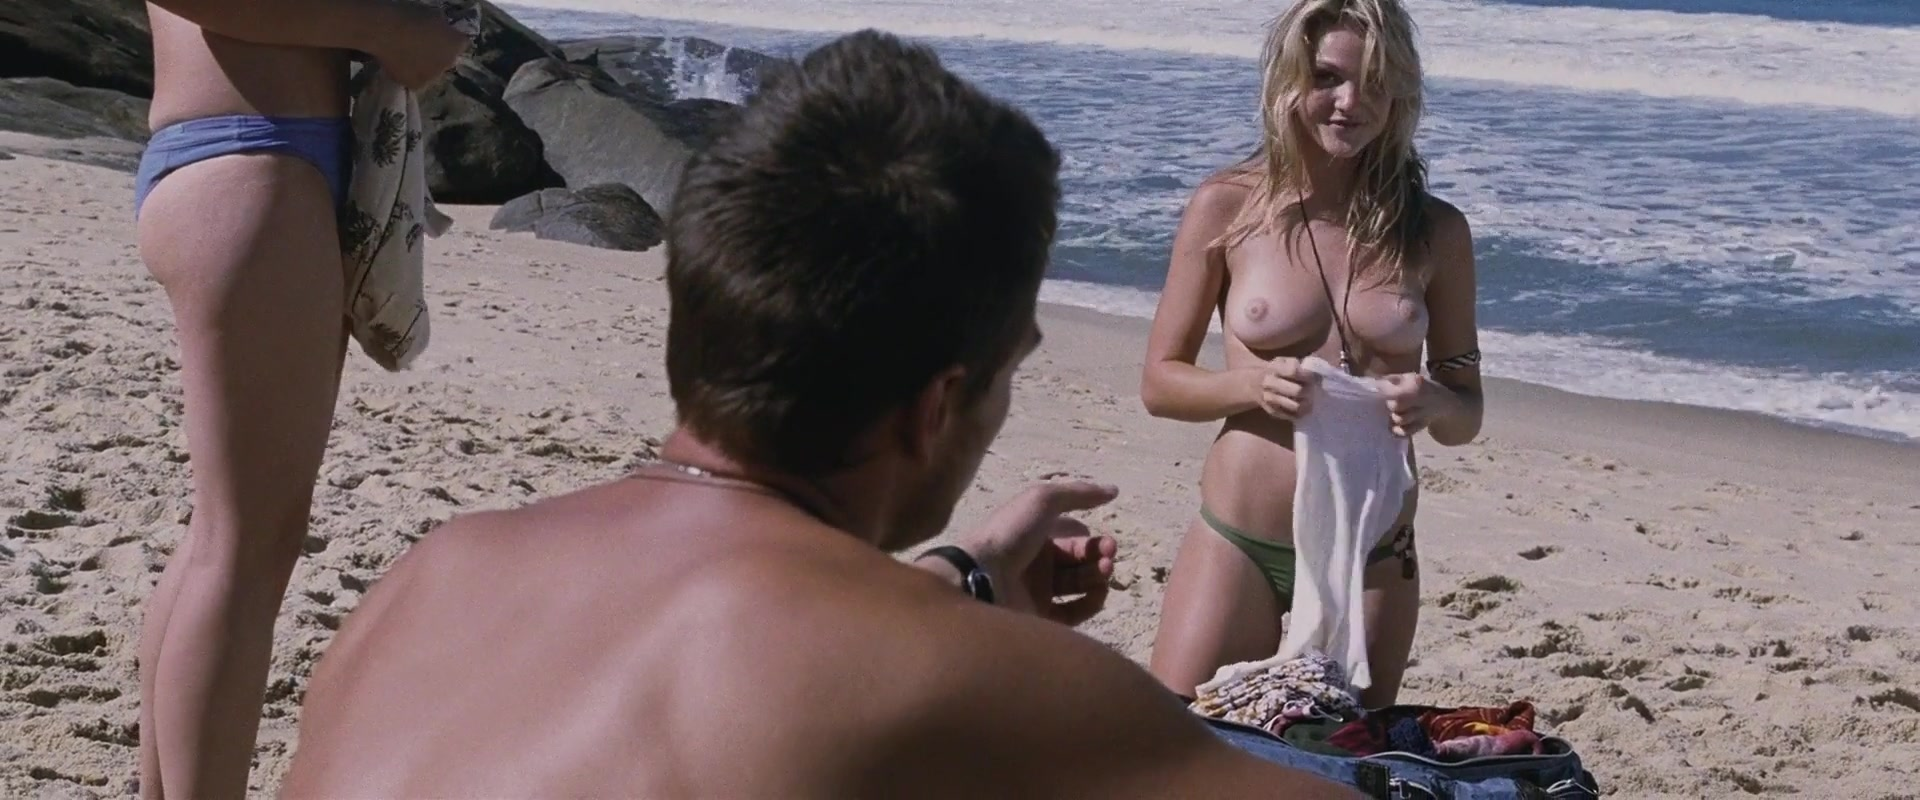 Olivia Wilde sex video rosyjskie dojrzałe strony porno